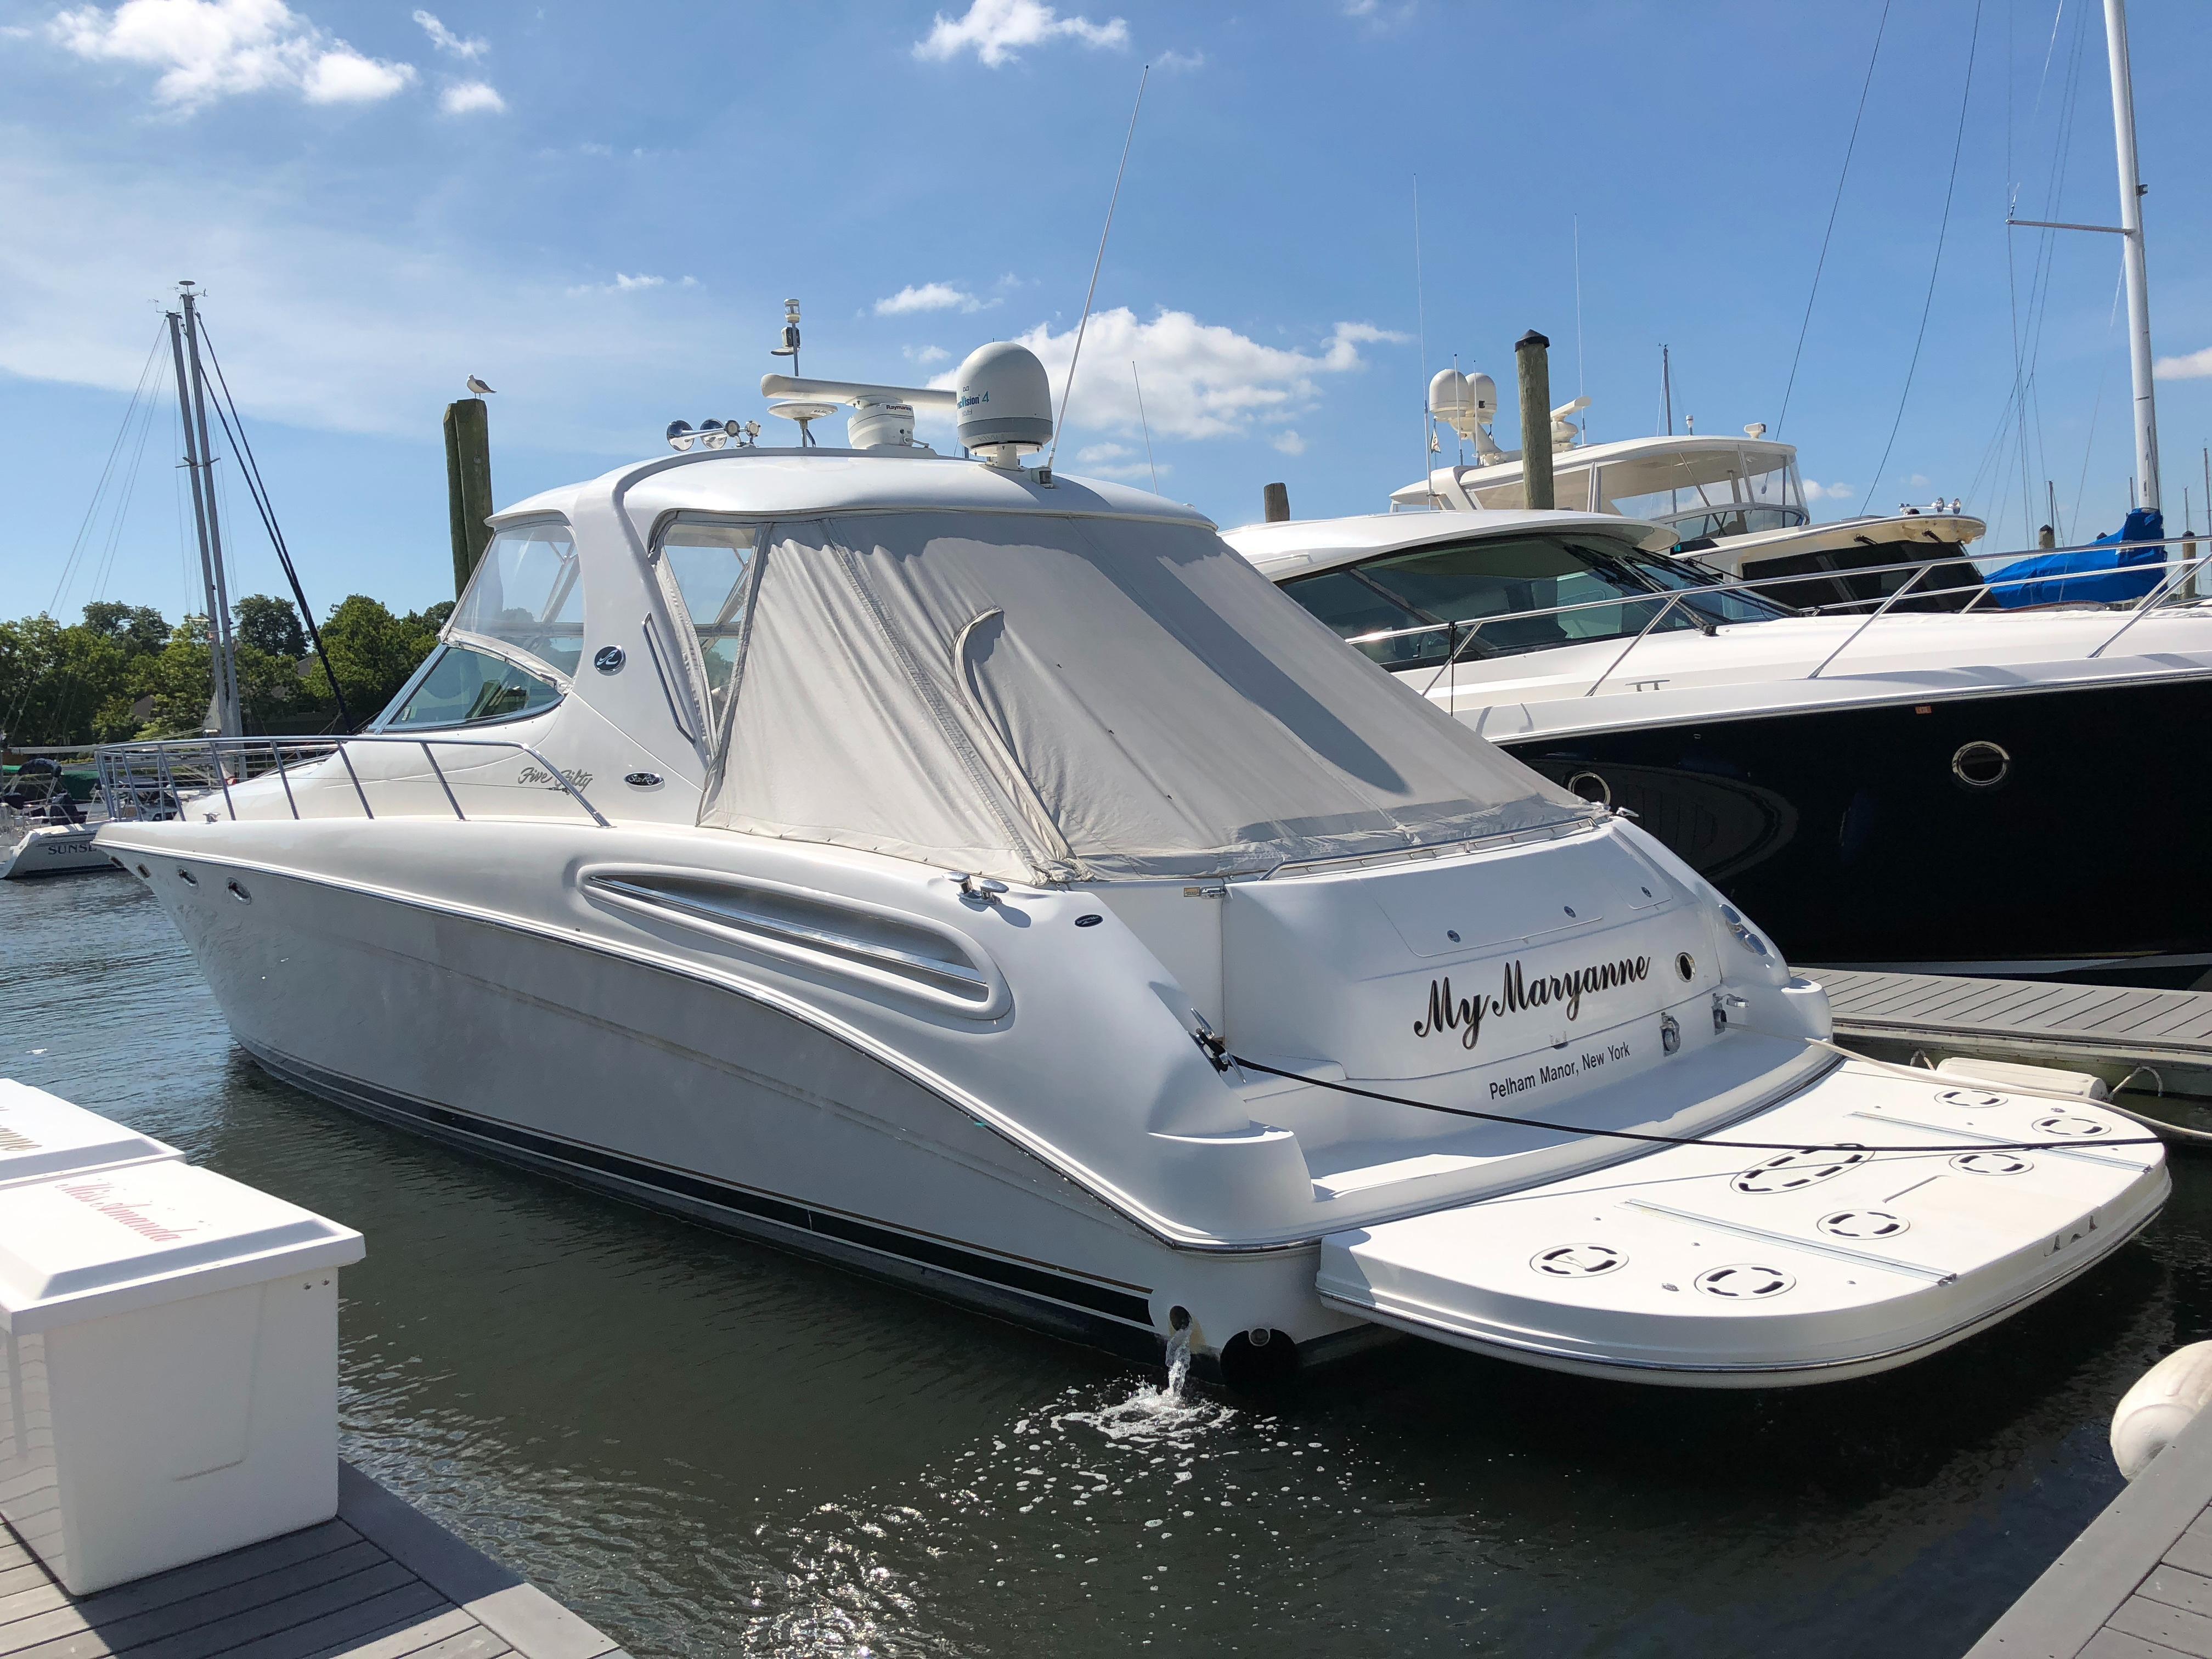 55 ft Sea Ray 550 Sundancer